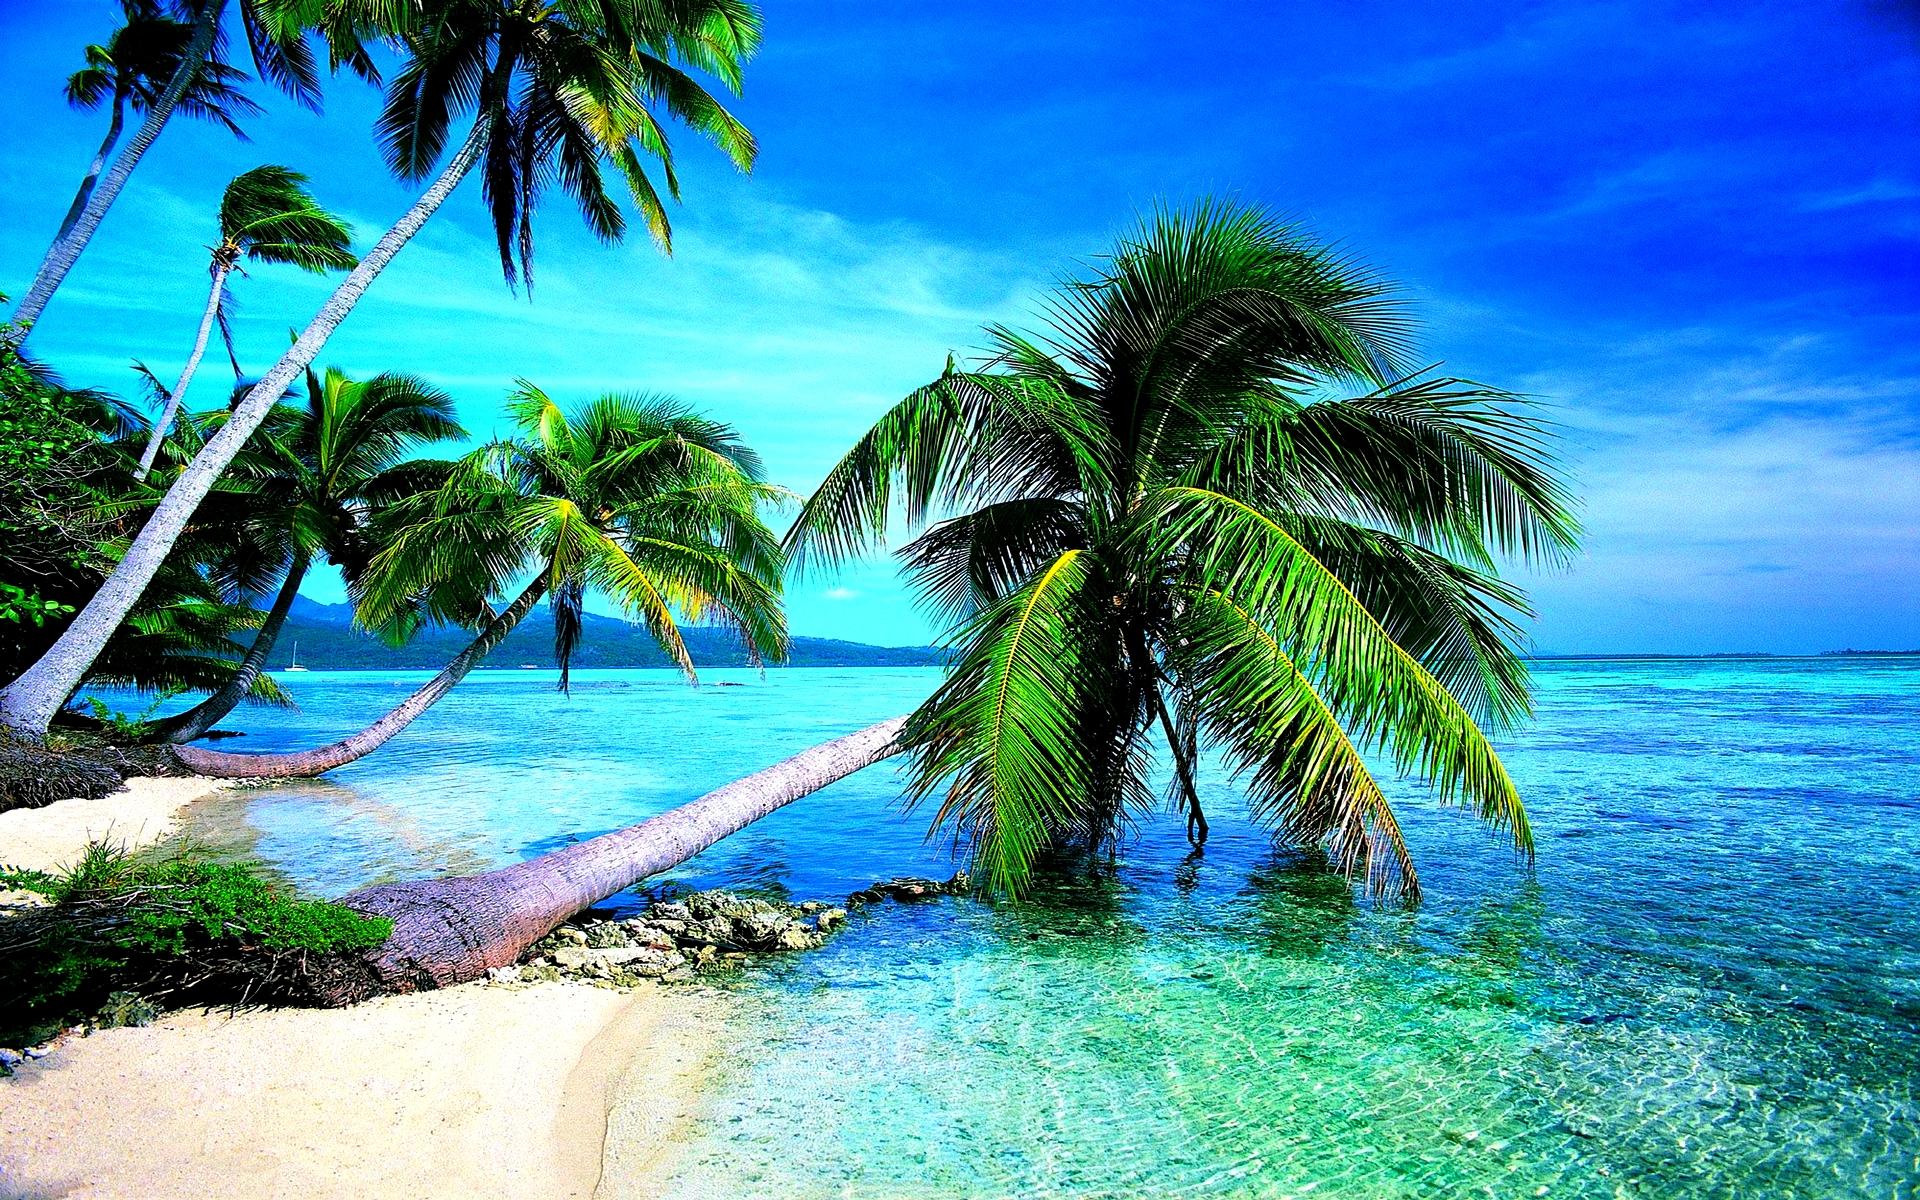 Download tropical beach images wallpapers   Desktop ...